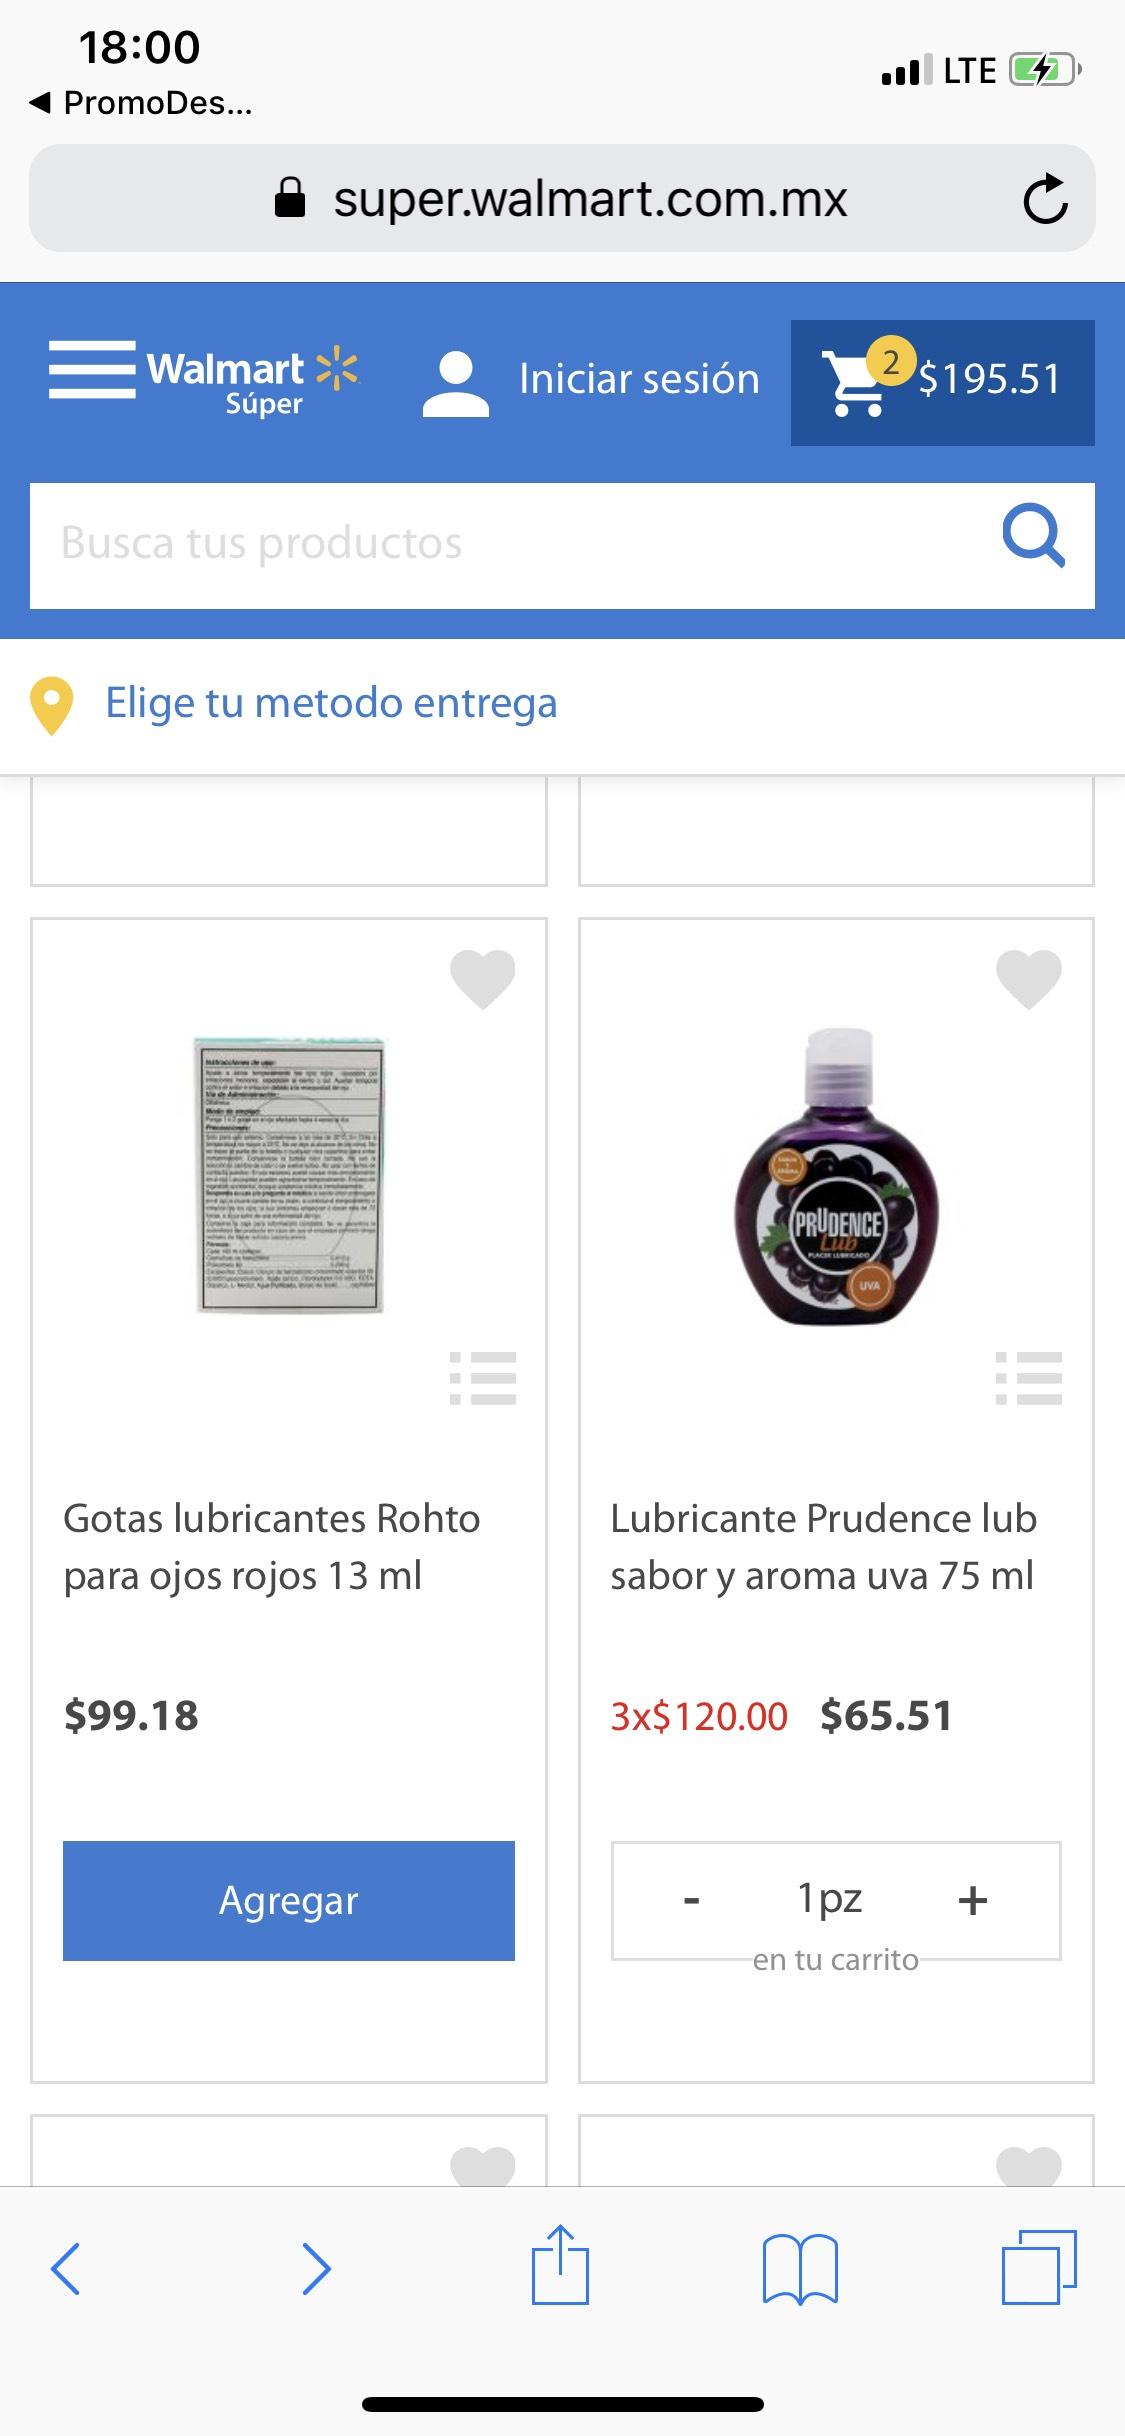 Walmart Súper: Lubricante Prudence a 3x$120